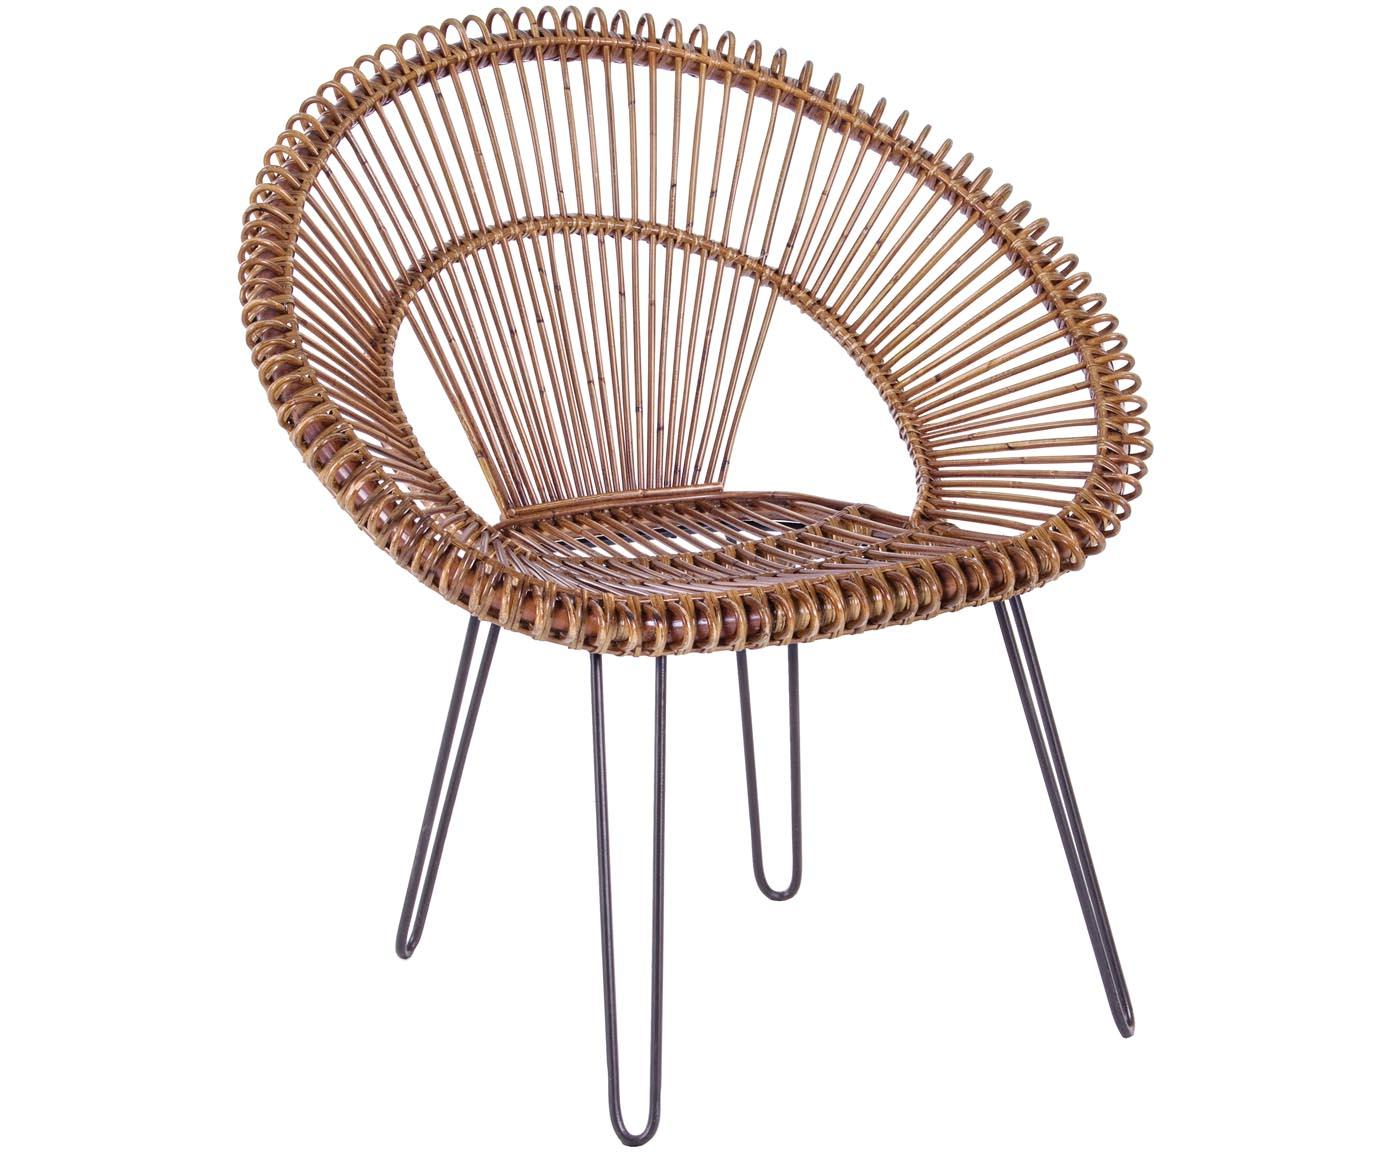 Rattan-Sessel Esteban, Sitzschale: Rattan, Beine: Stahl, Sitzschale: Rattan<br>Beine: Stahl, 64 x 89 cm